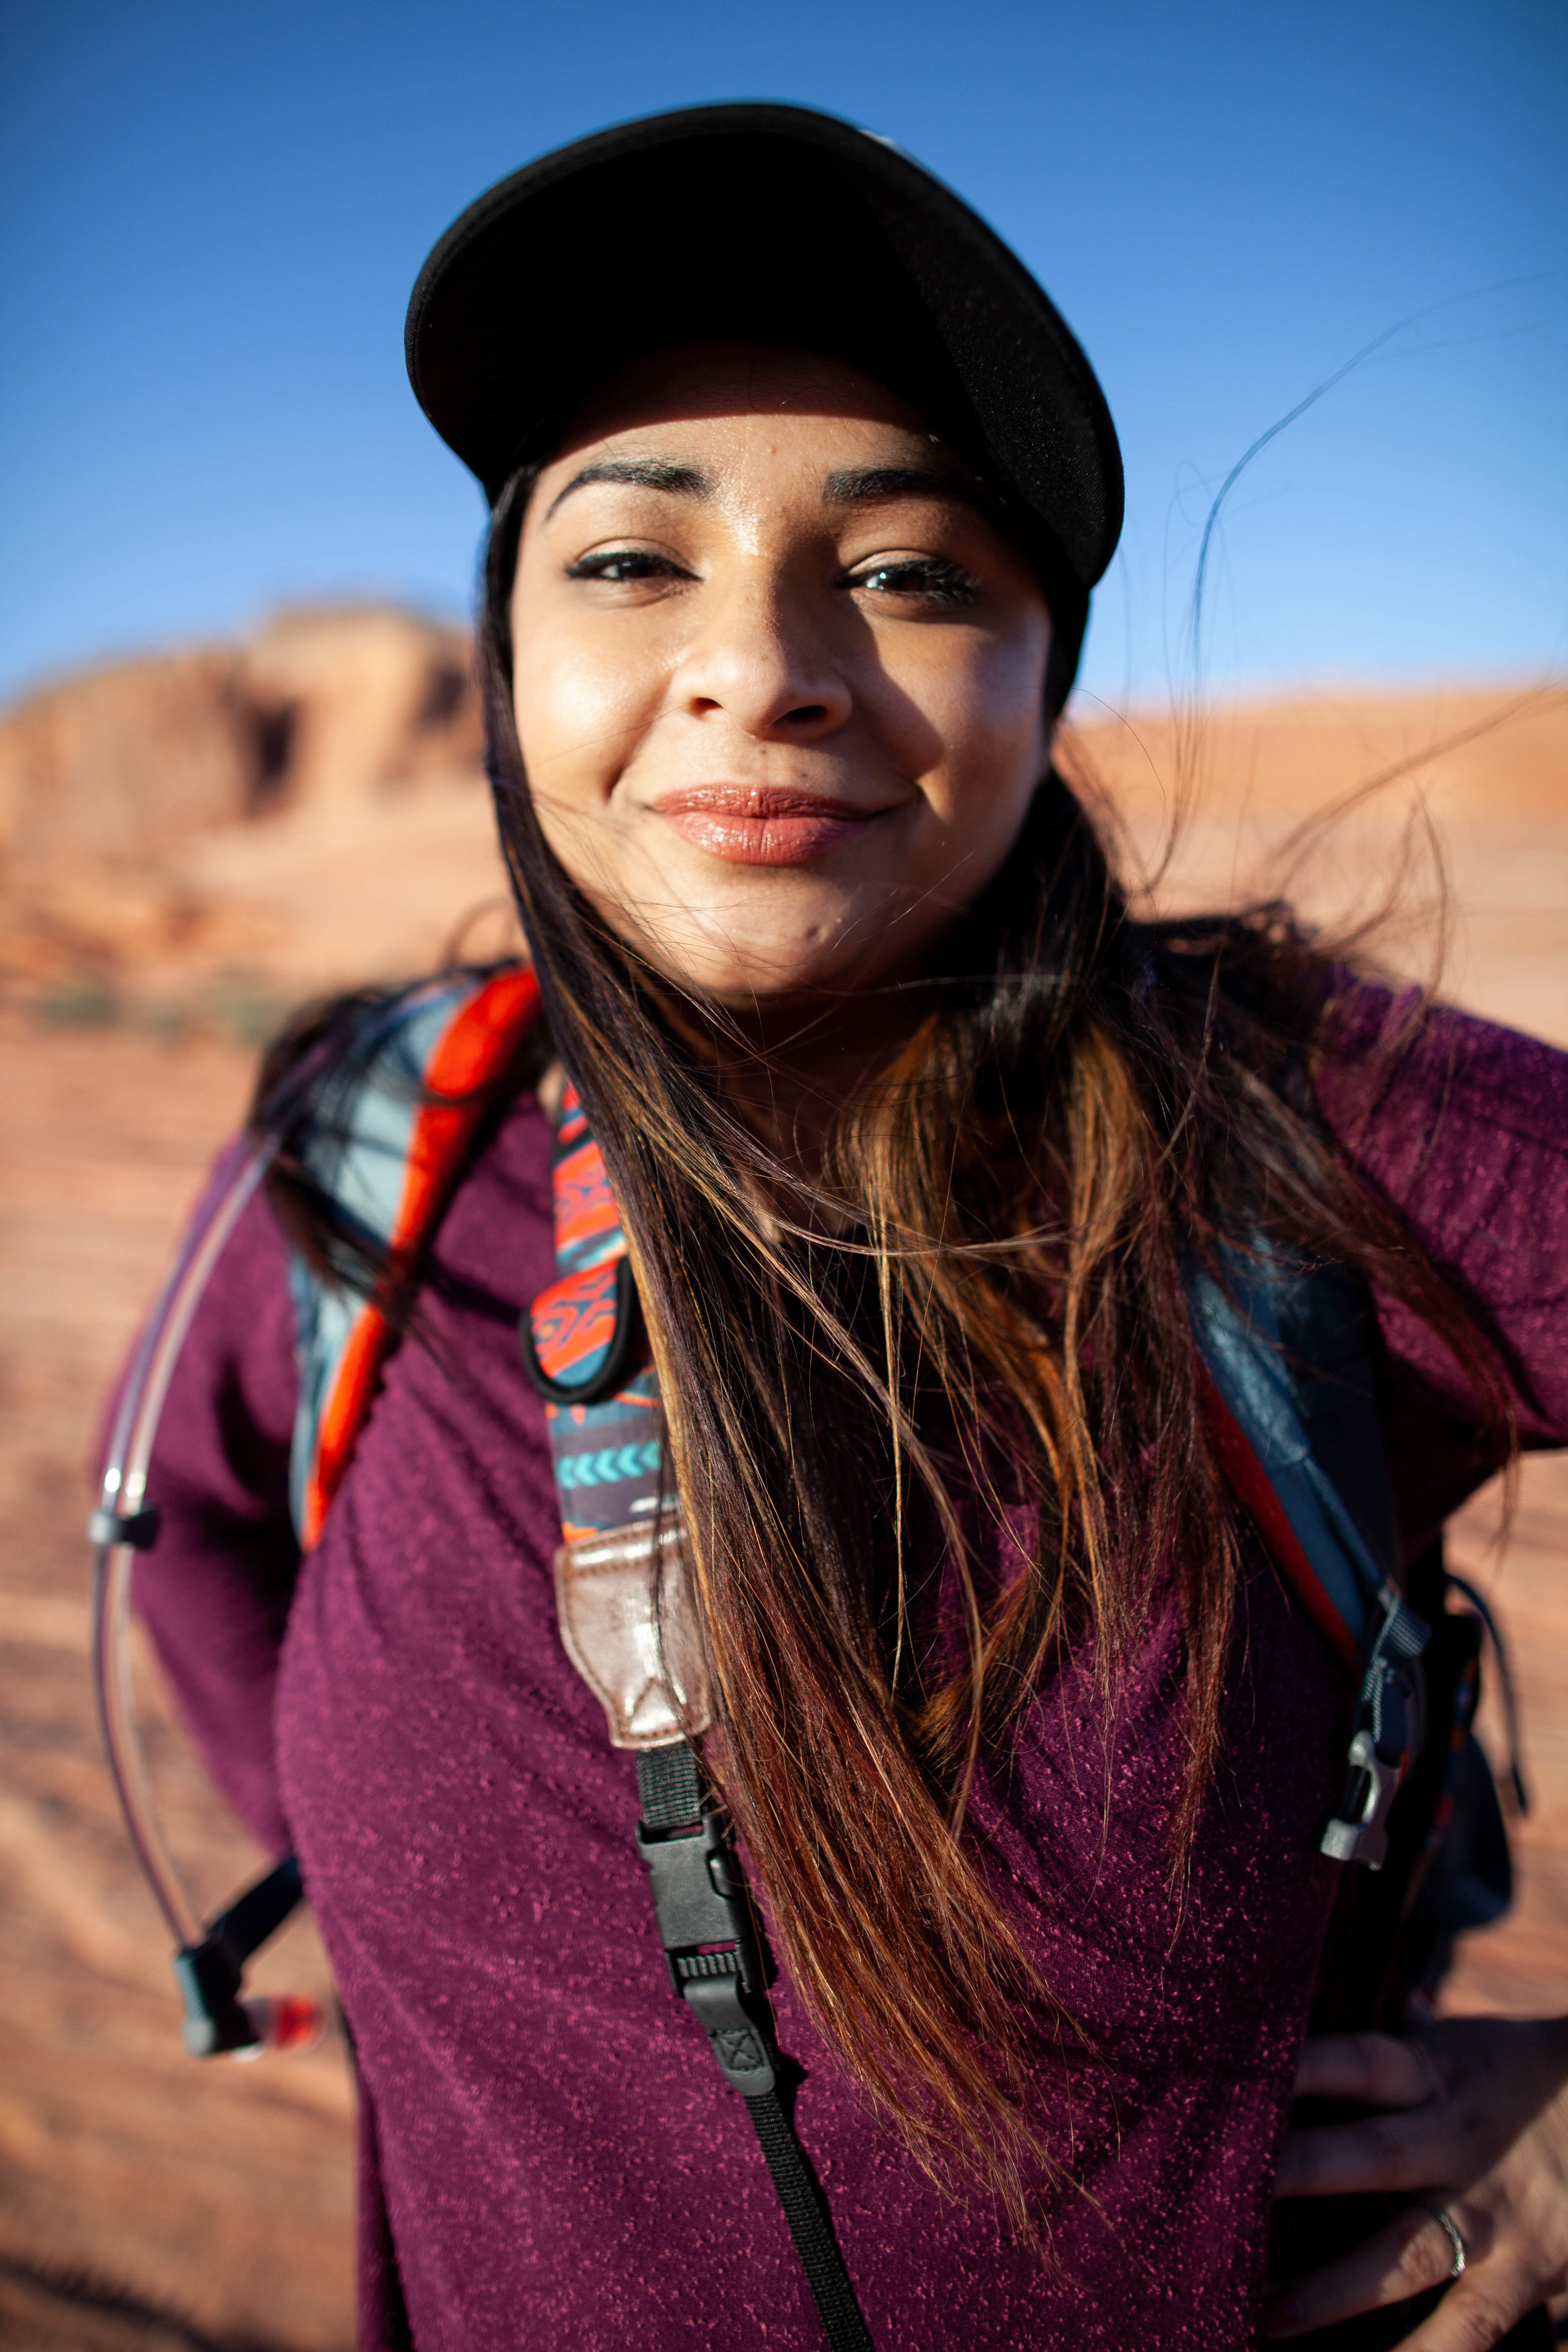 Ambreen tariq - Founder, @BrownPeopleCamping